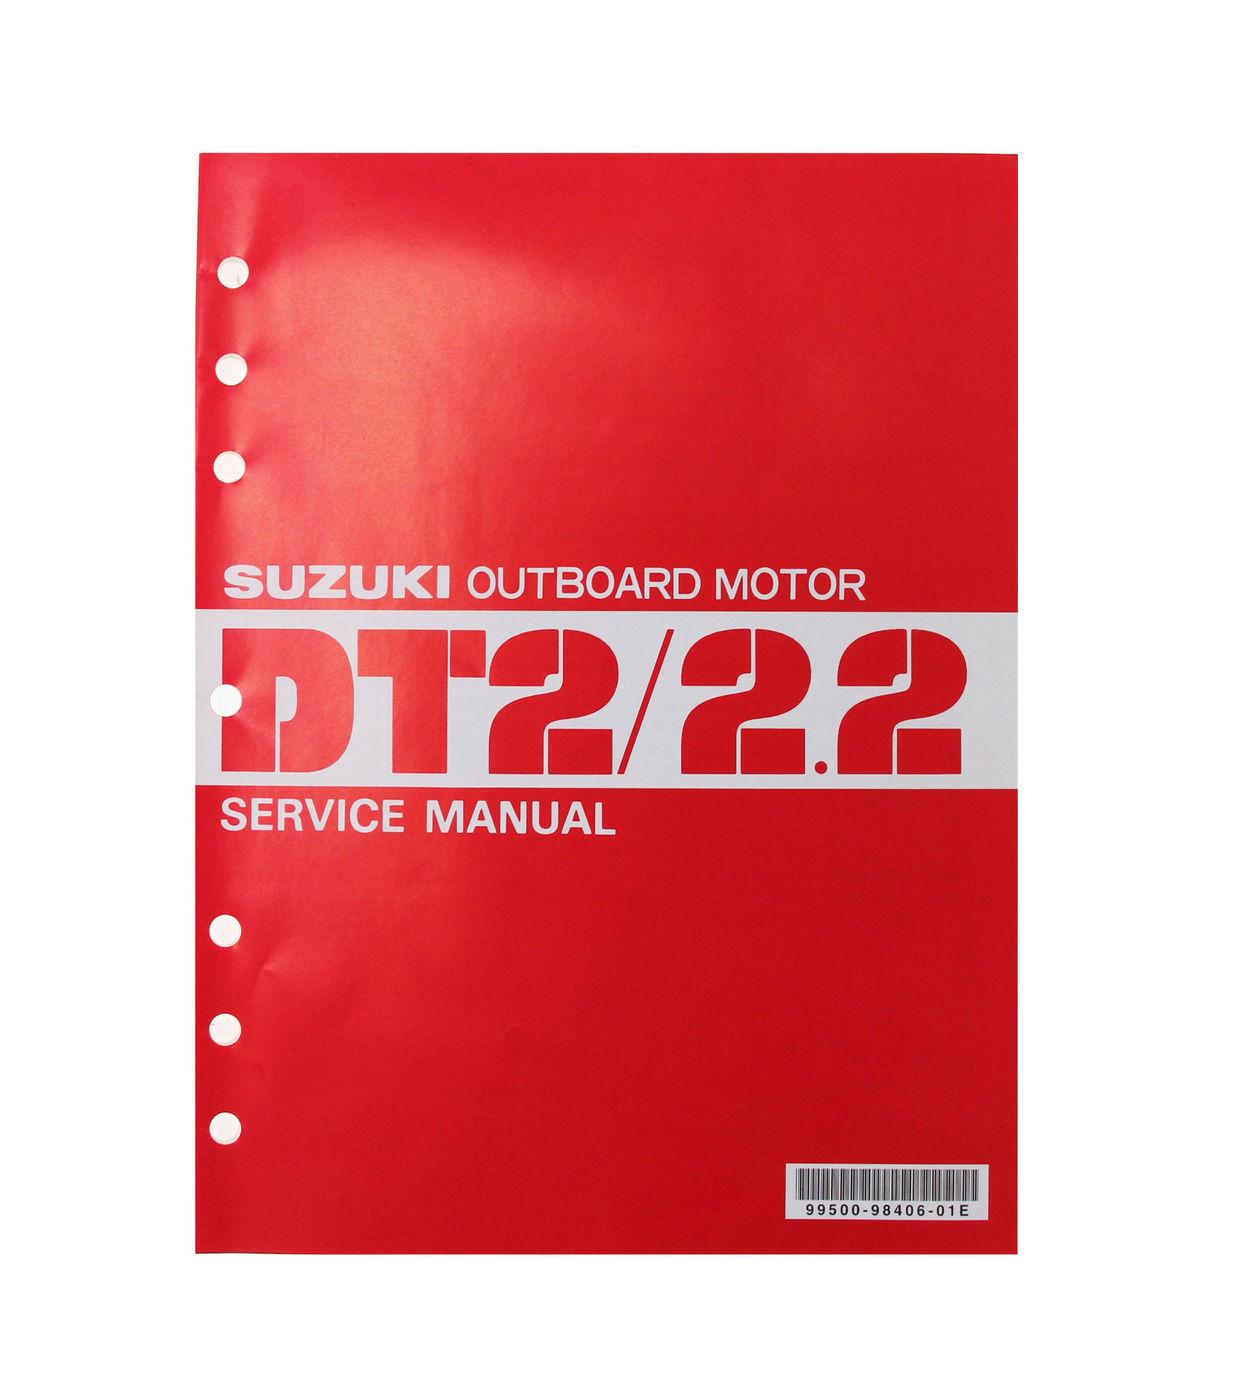 Manual de serviço suzuki dt2-2. 2 (inglês) 995009840601e